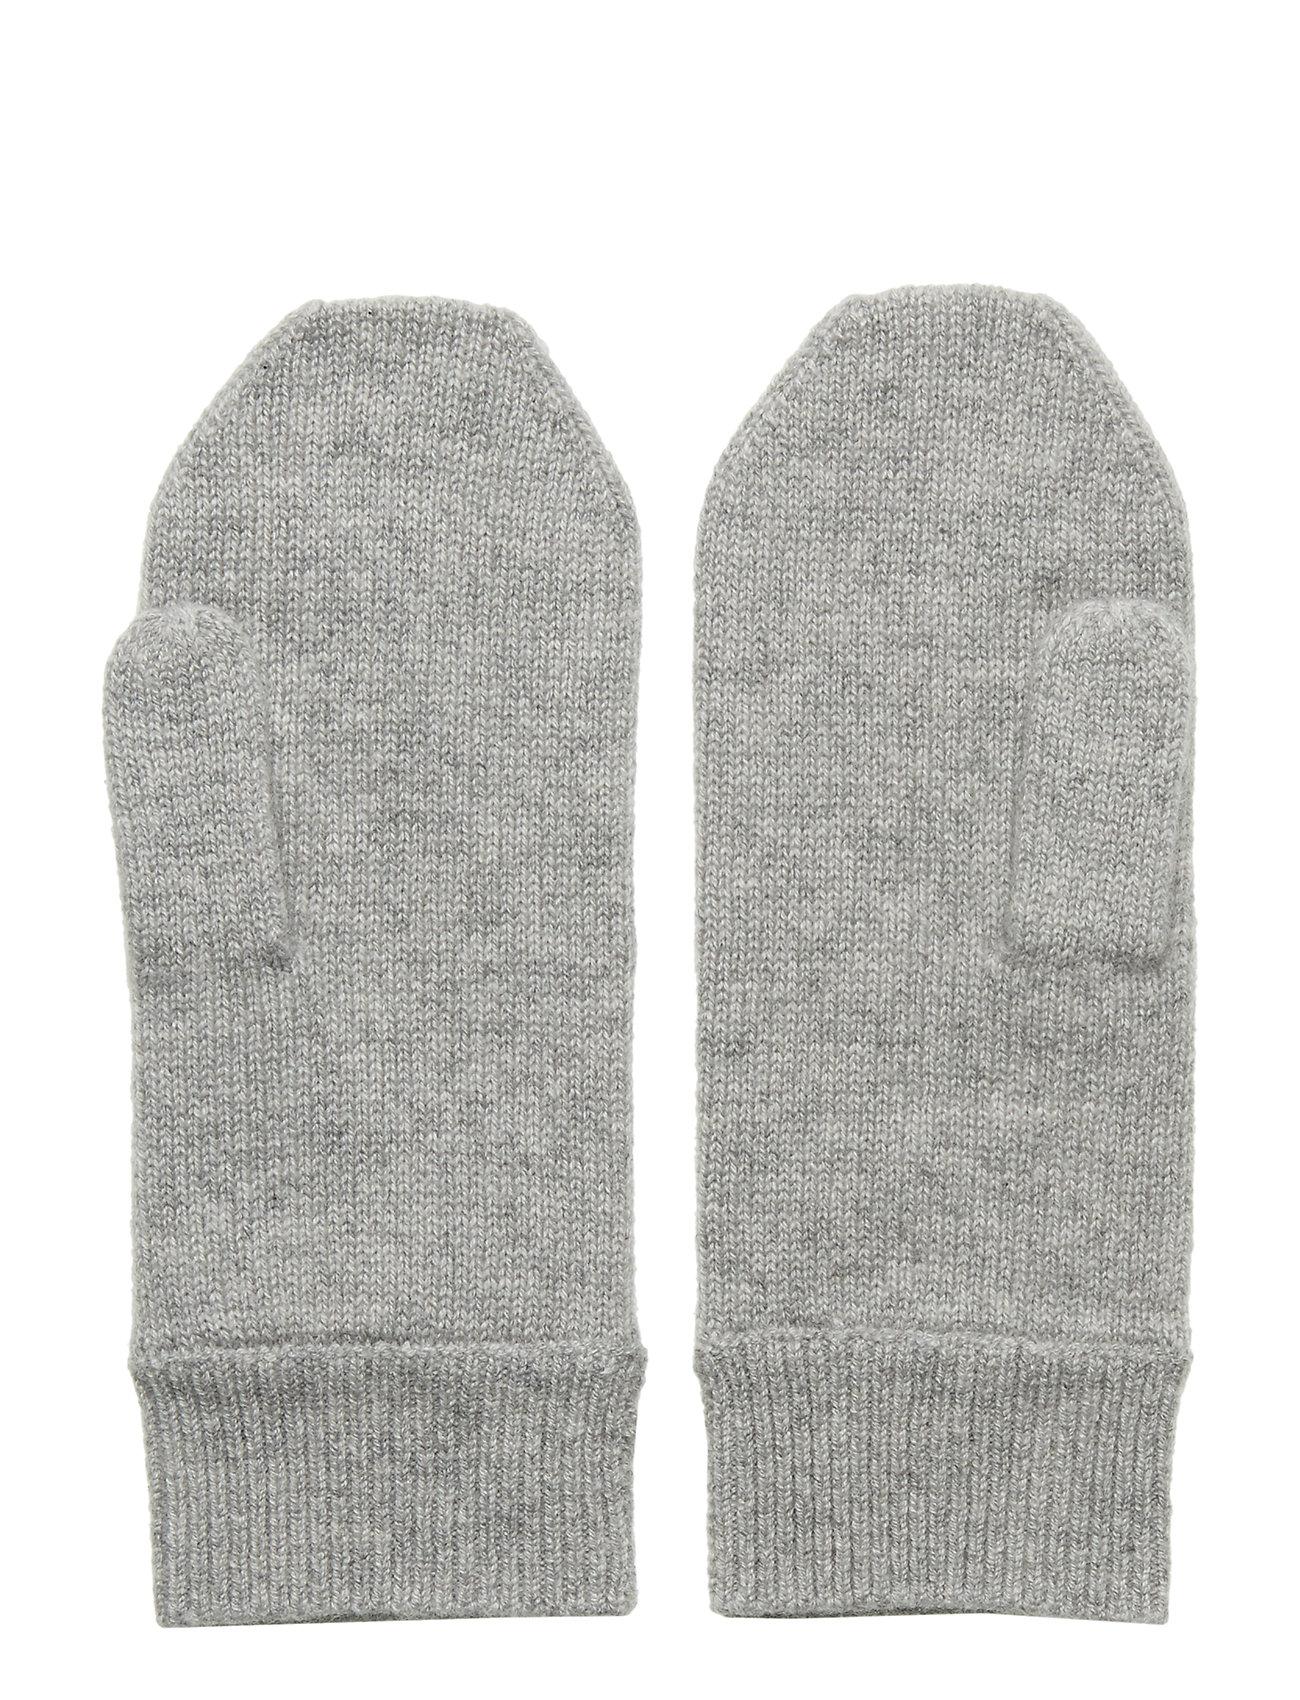 Davida Cashmere - Mittens - accessories - light grey - 1